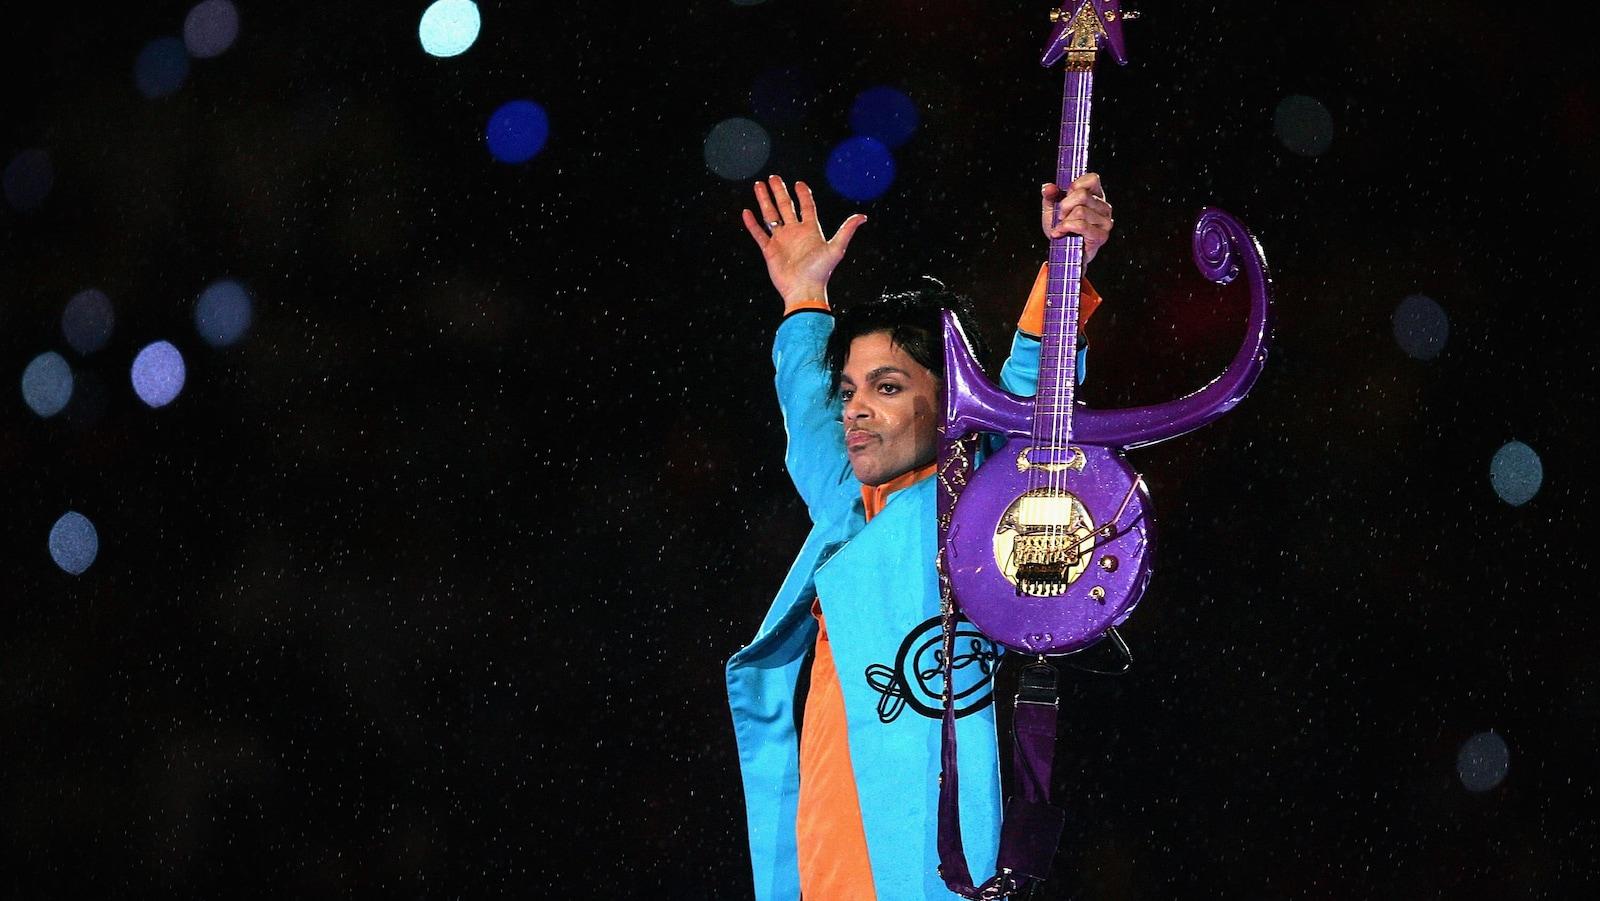 Prince en costume bleu brandit sa guitare